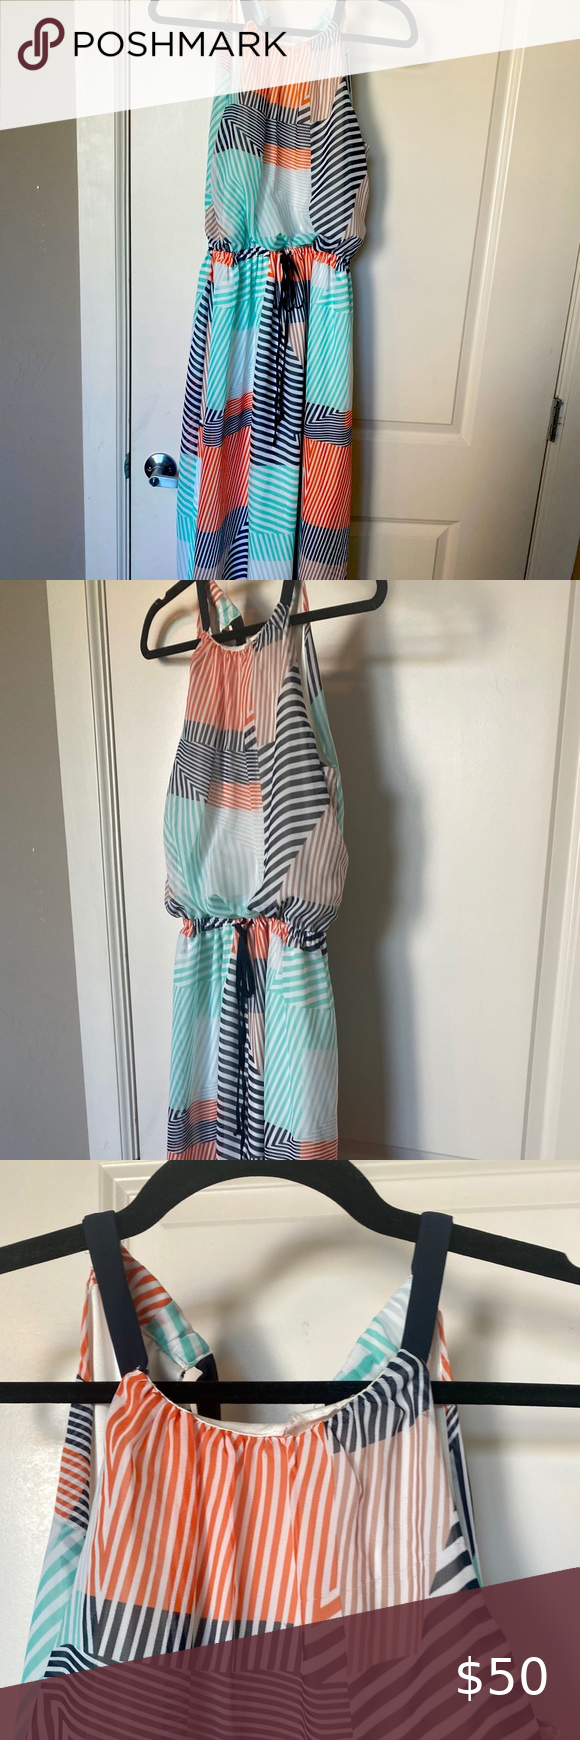 Vince Camuto Maxi Dress Maxi Dress Dresses Vince Camuto Dress [ 1740 x 580 Pixel ]